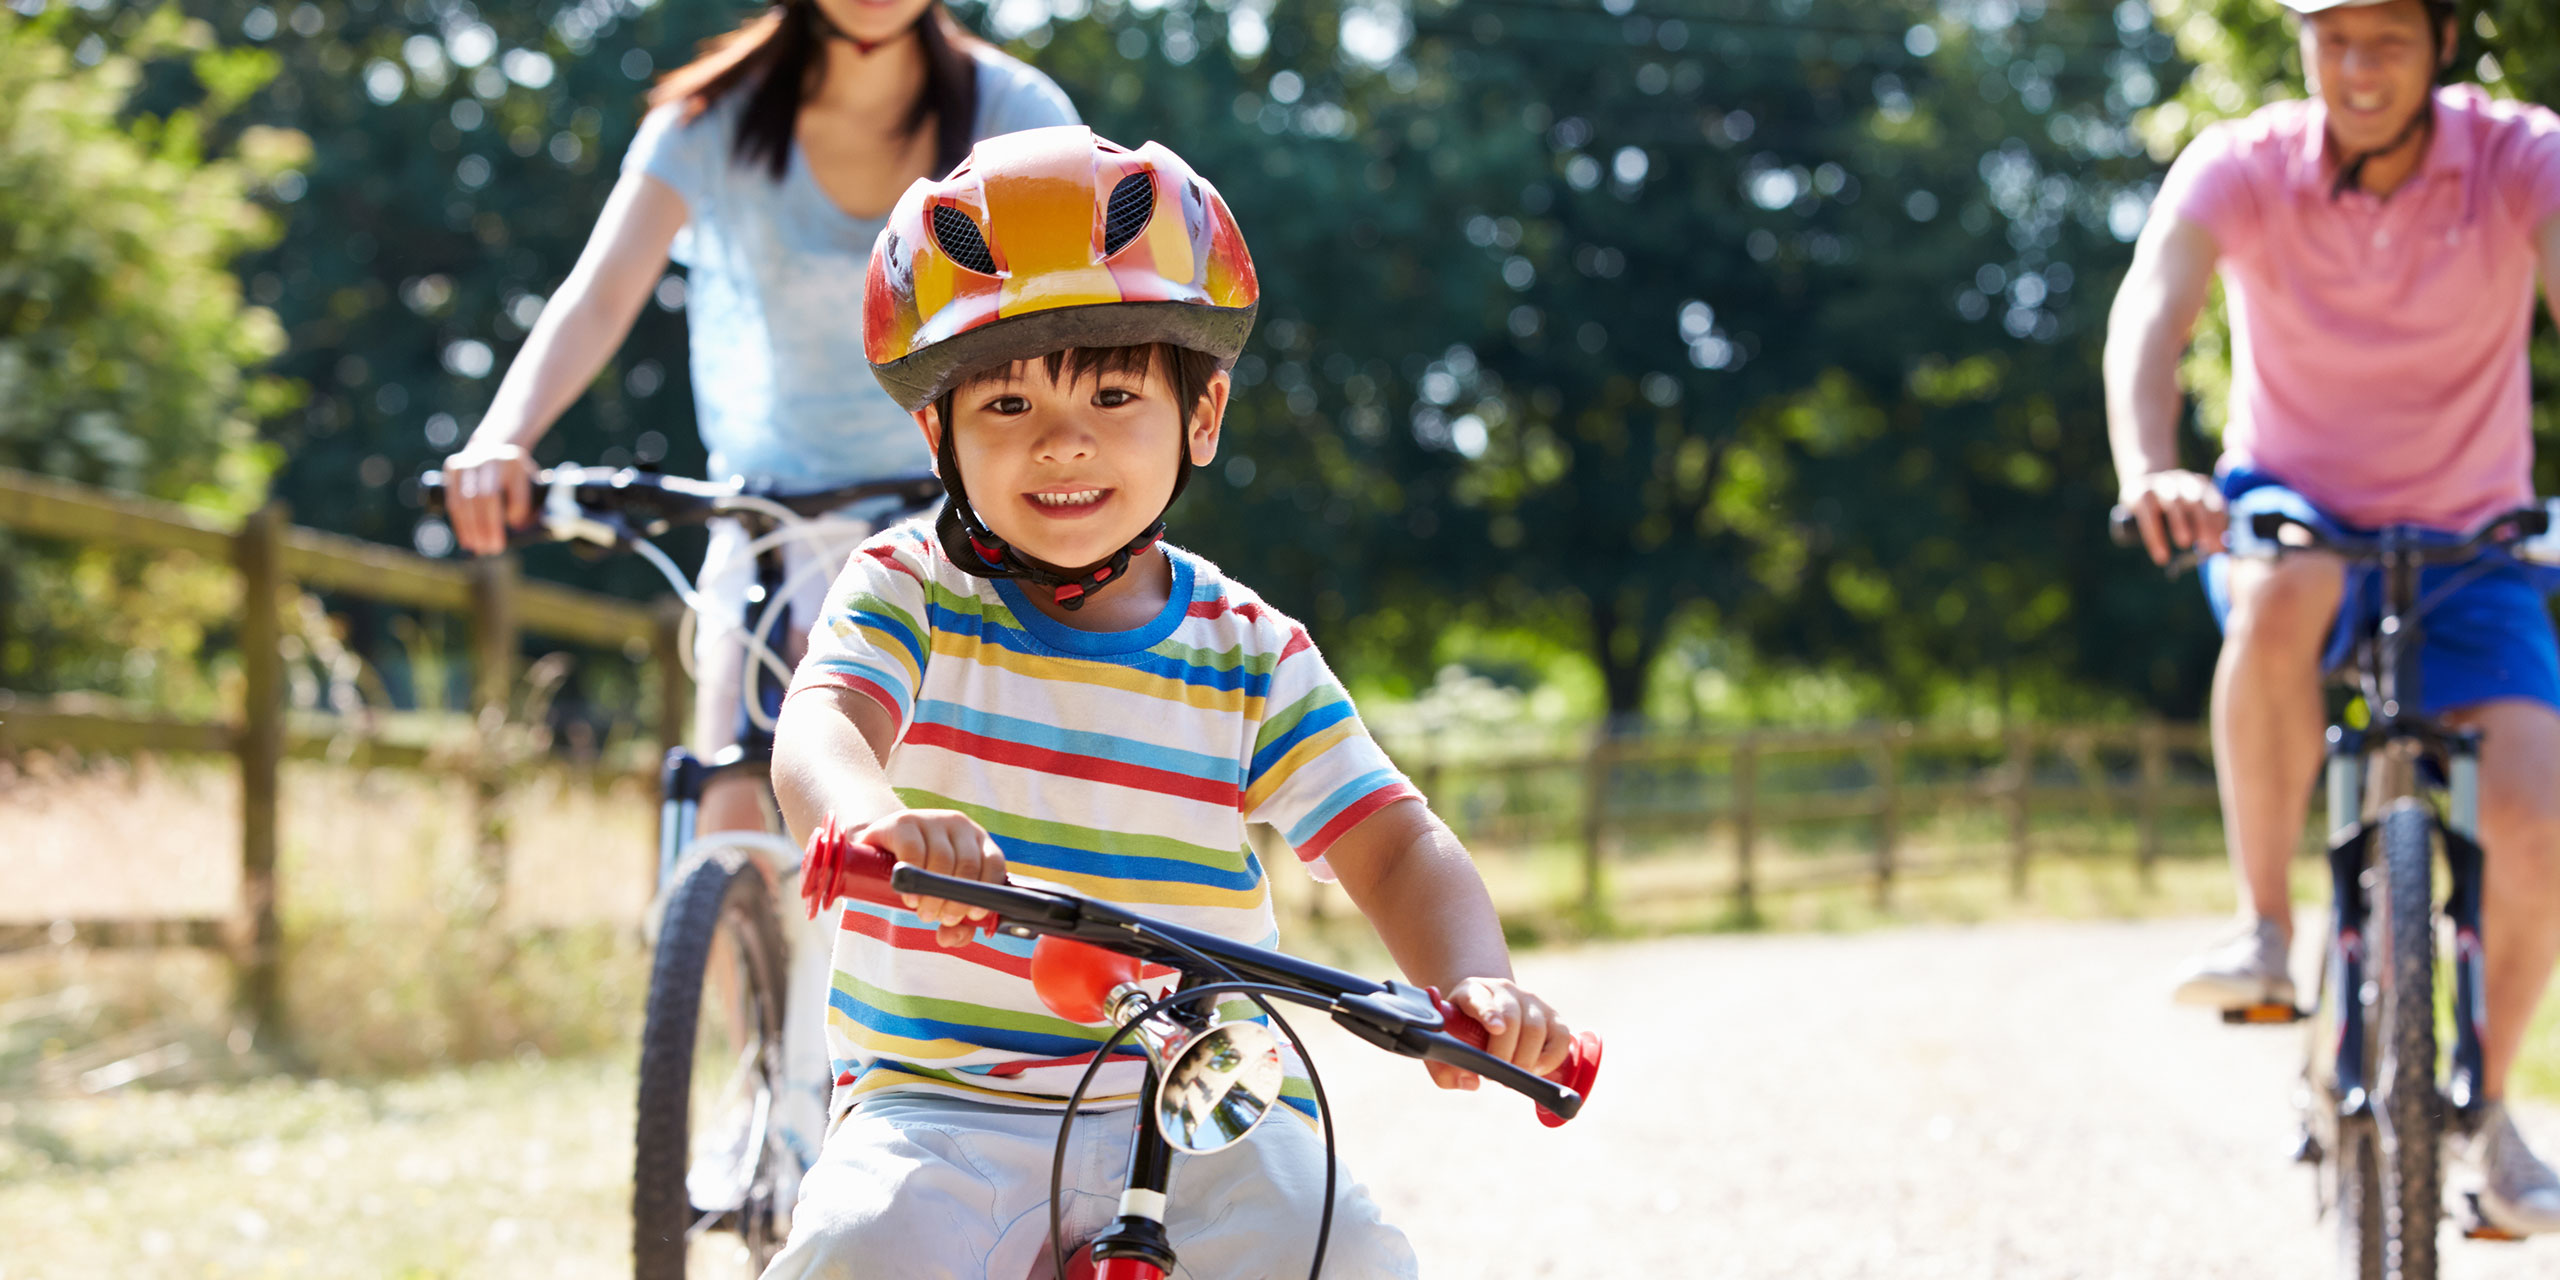 Child Biking; Courtesy of Monkey Business Images/Shutterstock.com